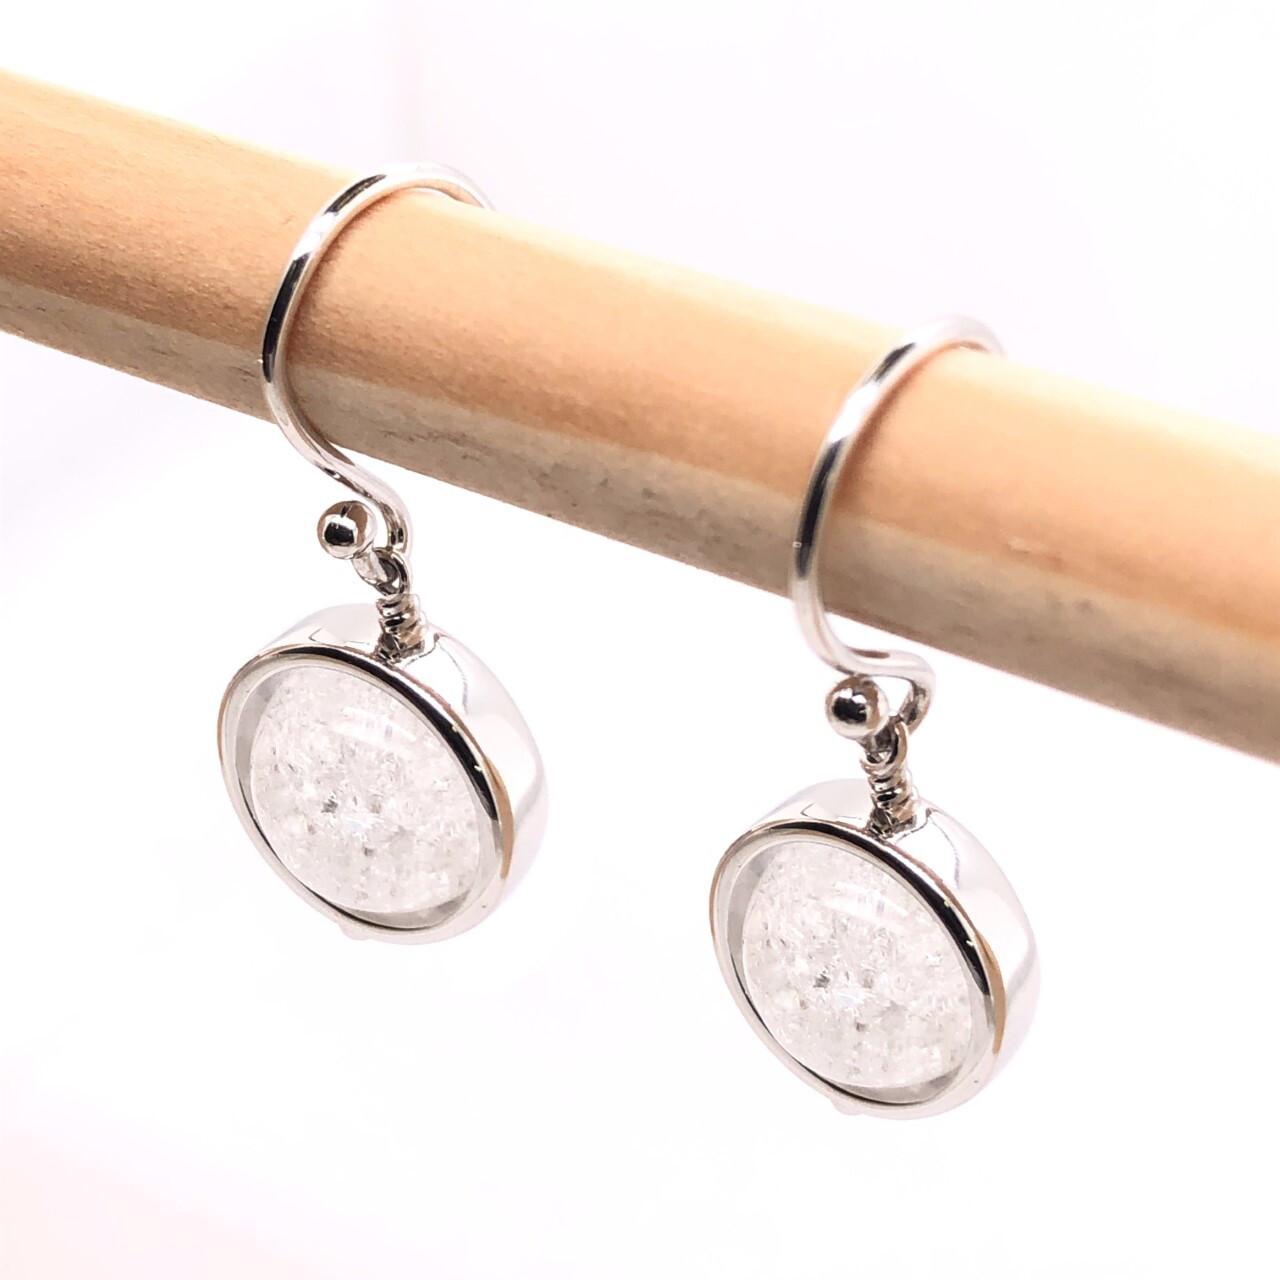 002 Quartz Crystal Earrings